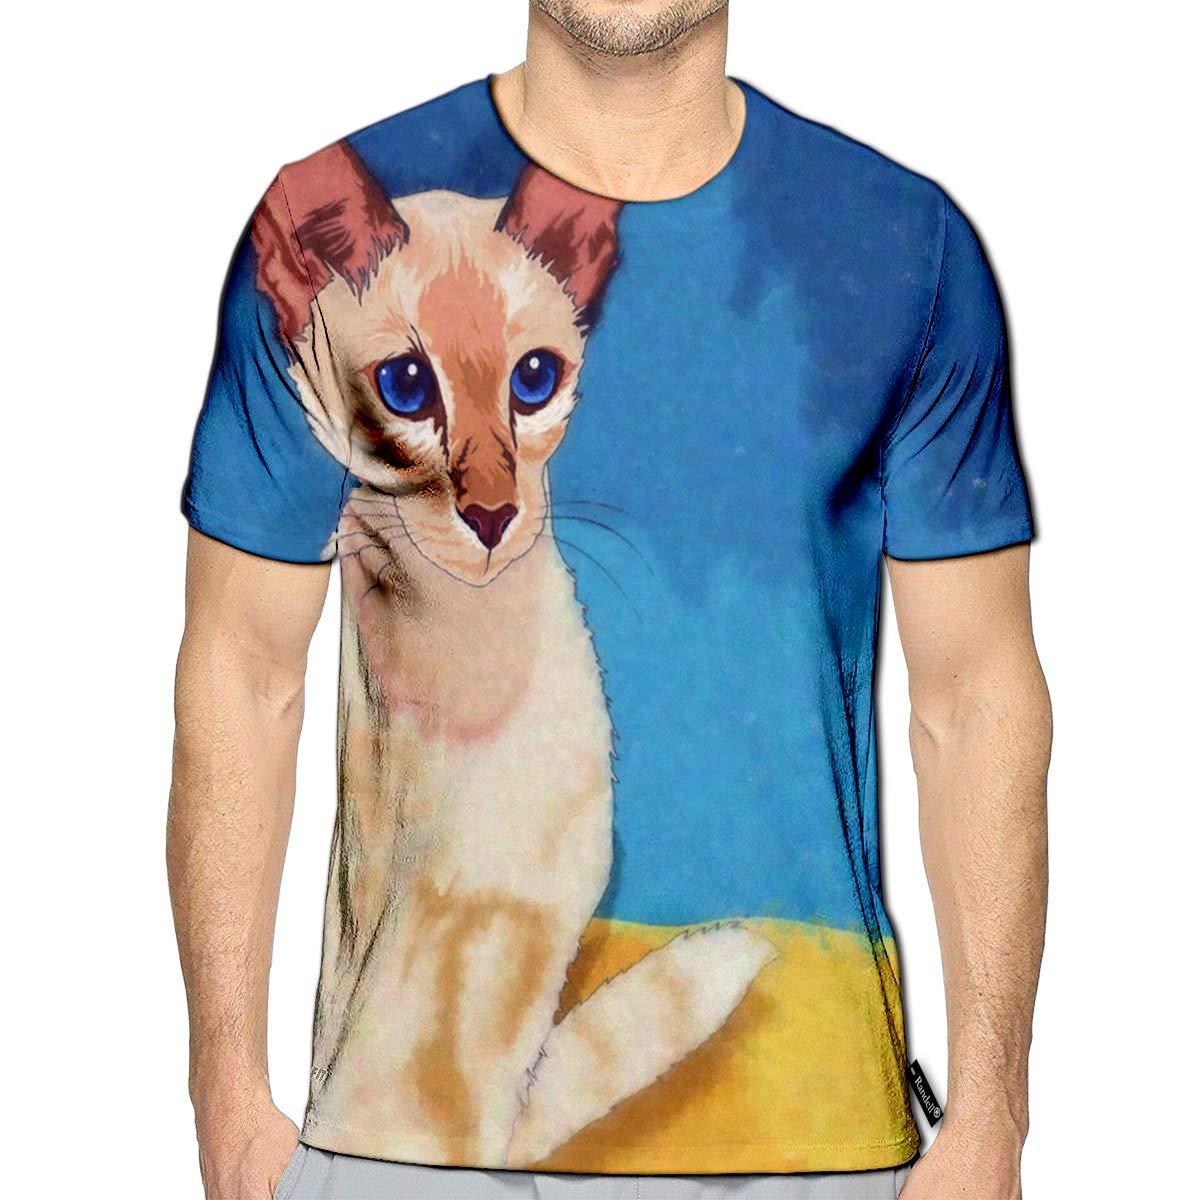 Randell 3D Printed T-Shirts Back to School Short Sleeve Tops Tees